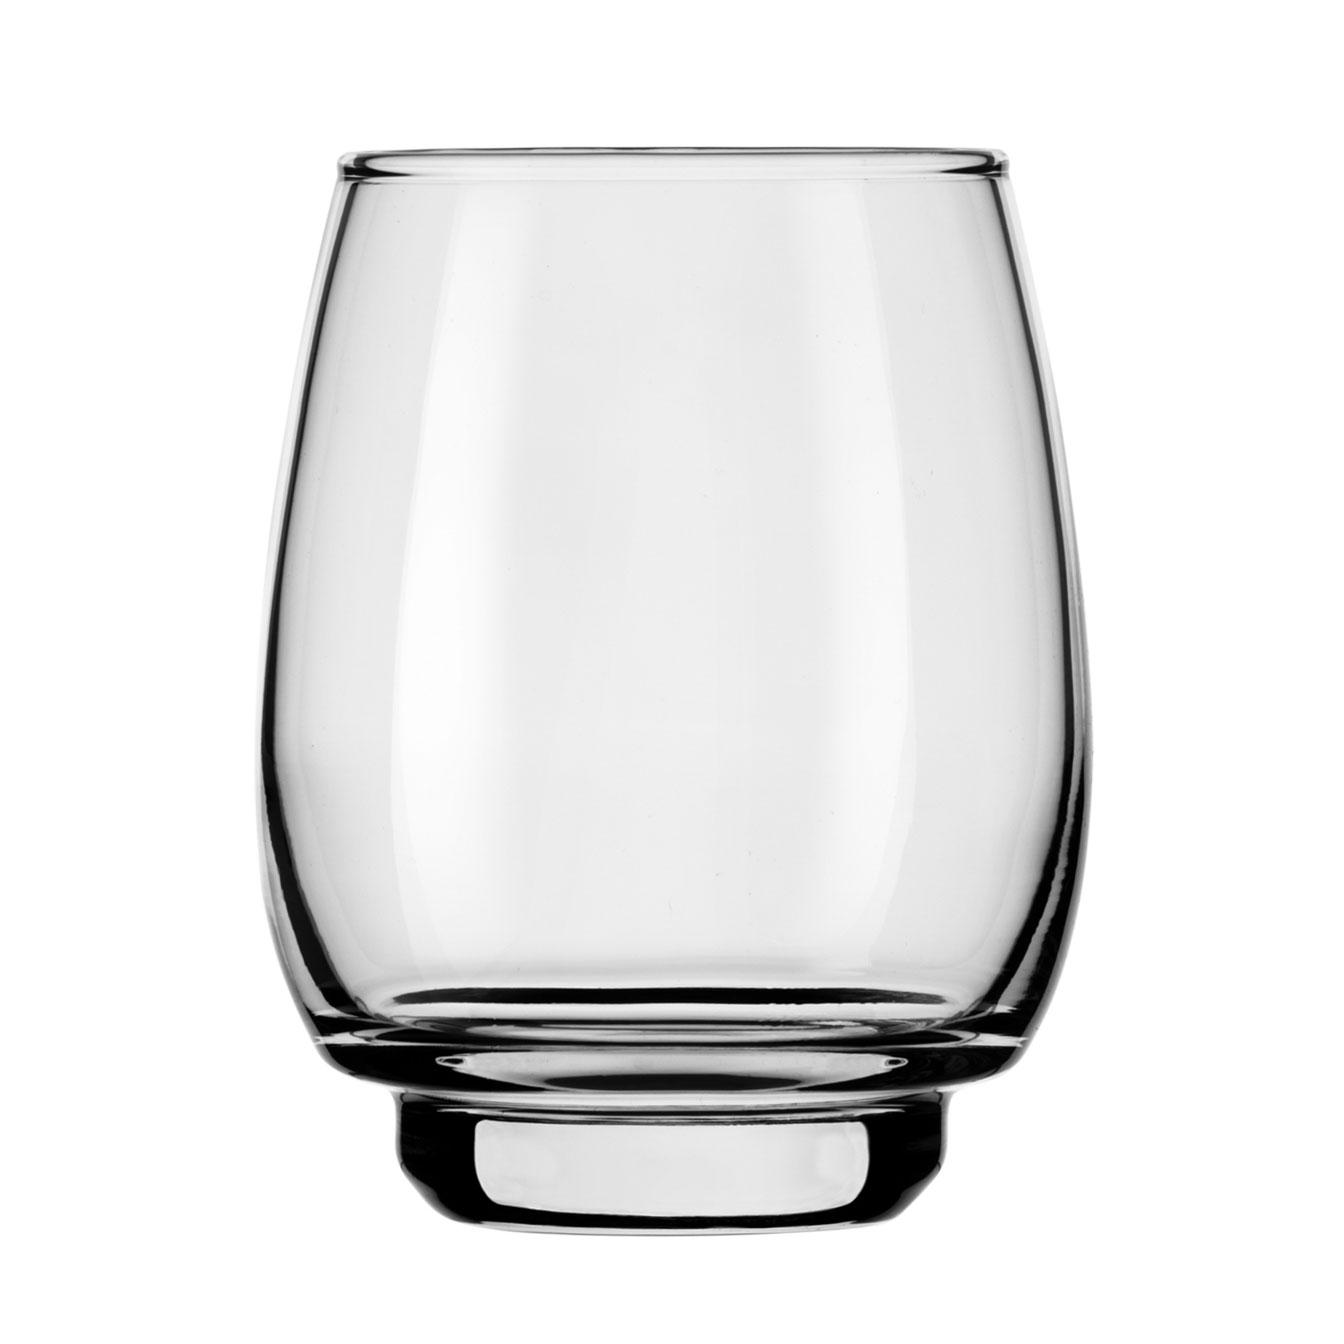 Libbey Glass 12015 glass, water / tumbler